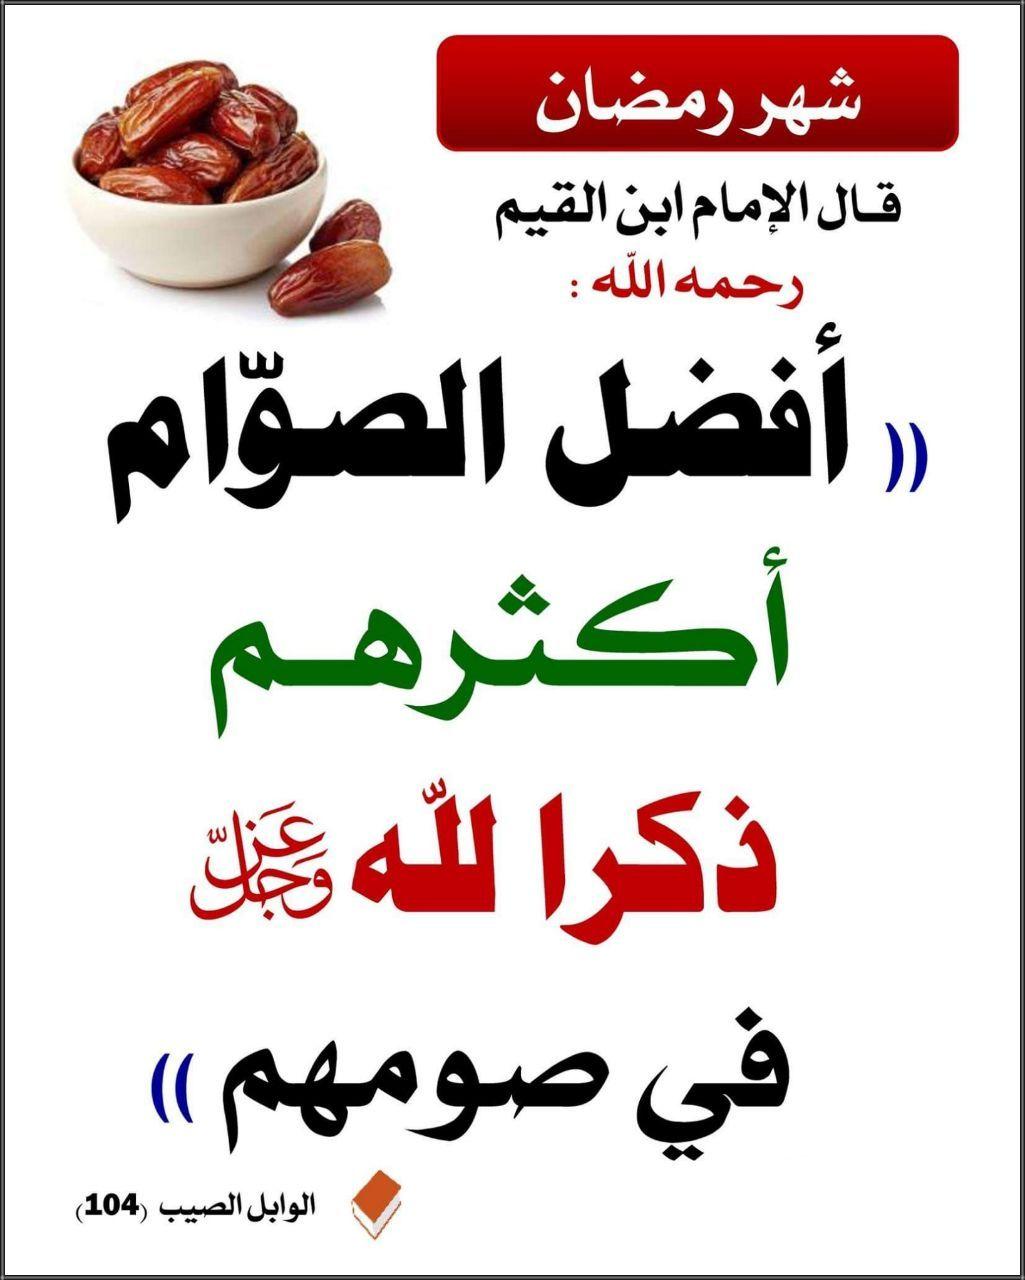 Pin By Hanane Ze On شهر رمضان Ramadan Islamic Information Hadith